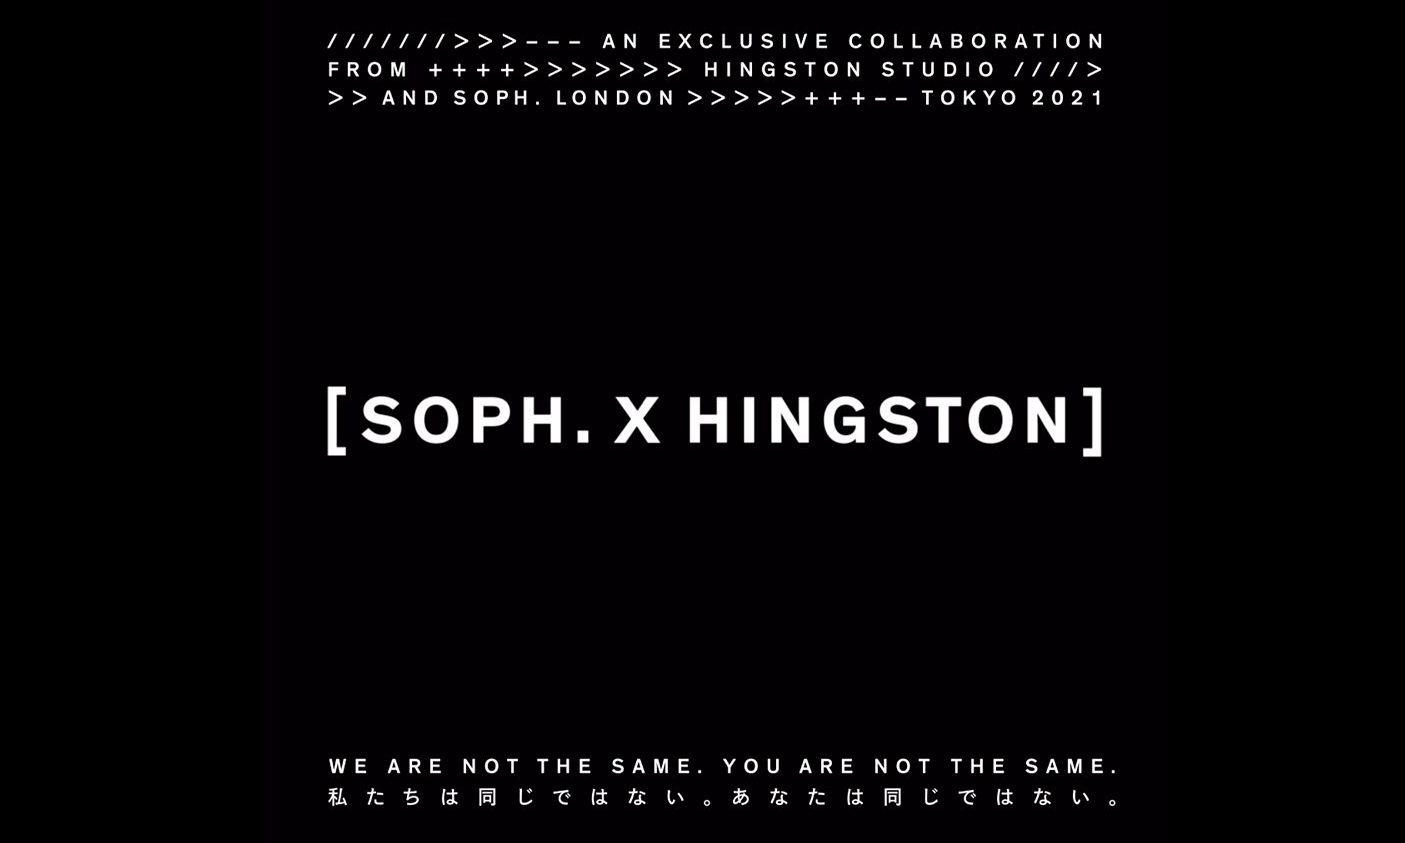 SOPHNET. 发布与 Hingston Studio 全新联乘企划